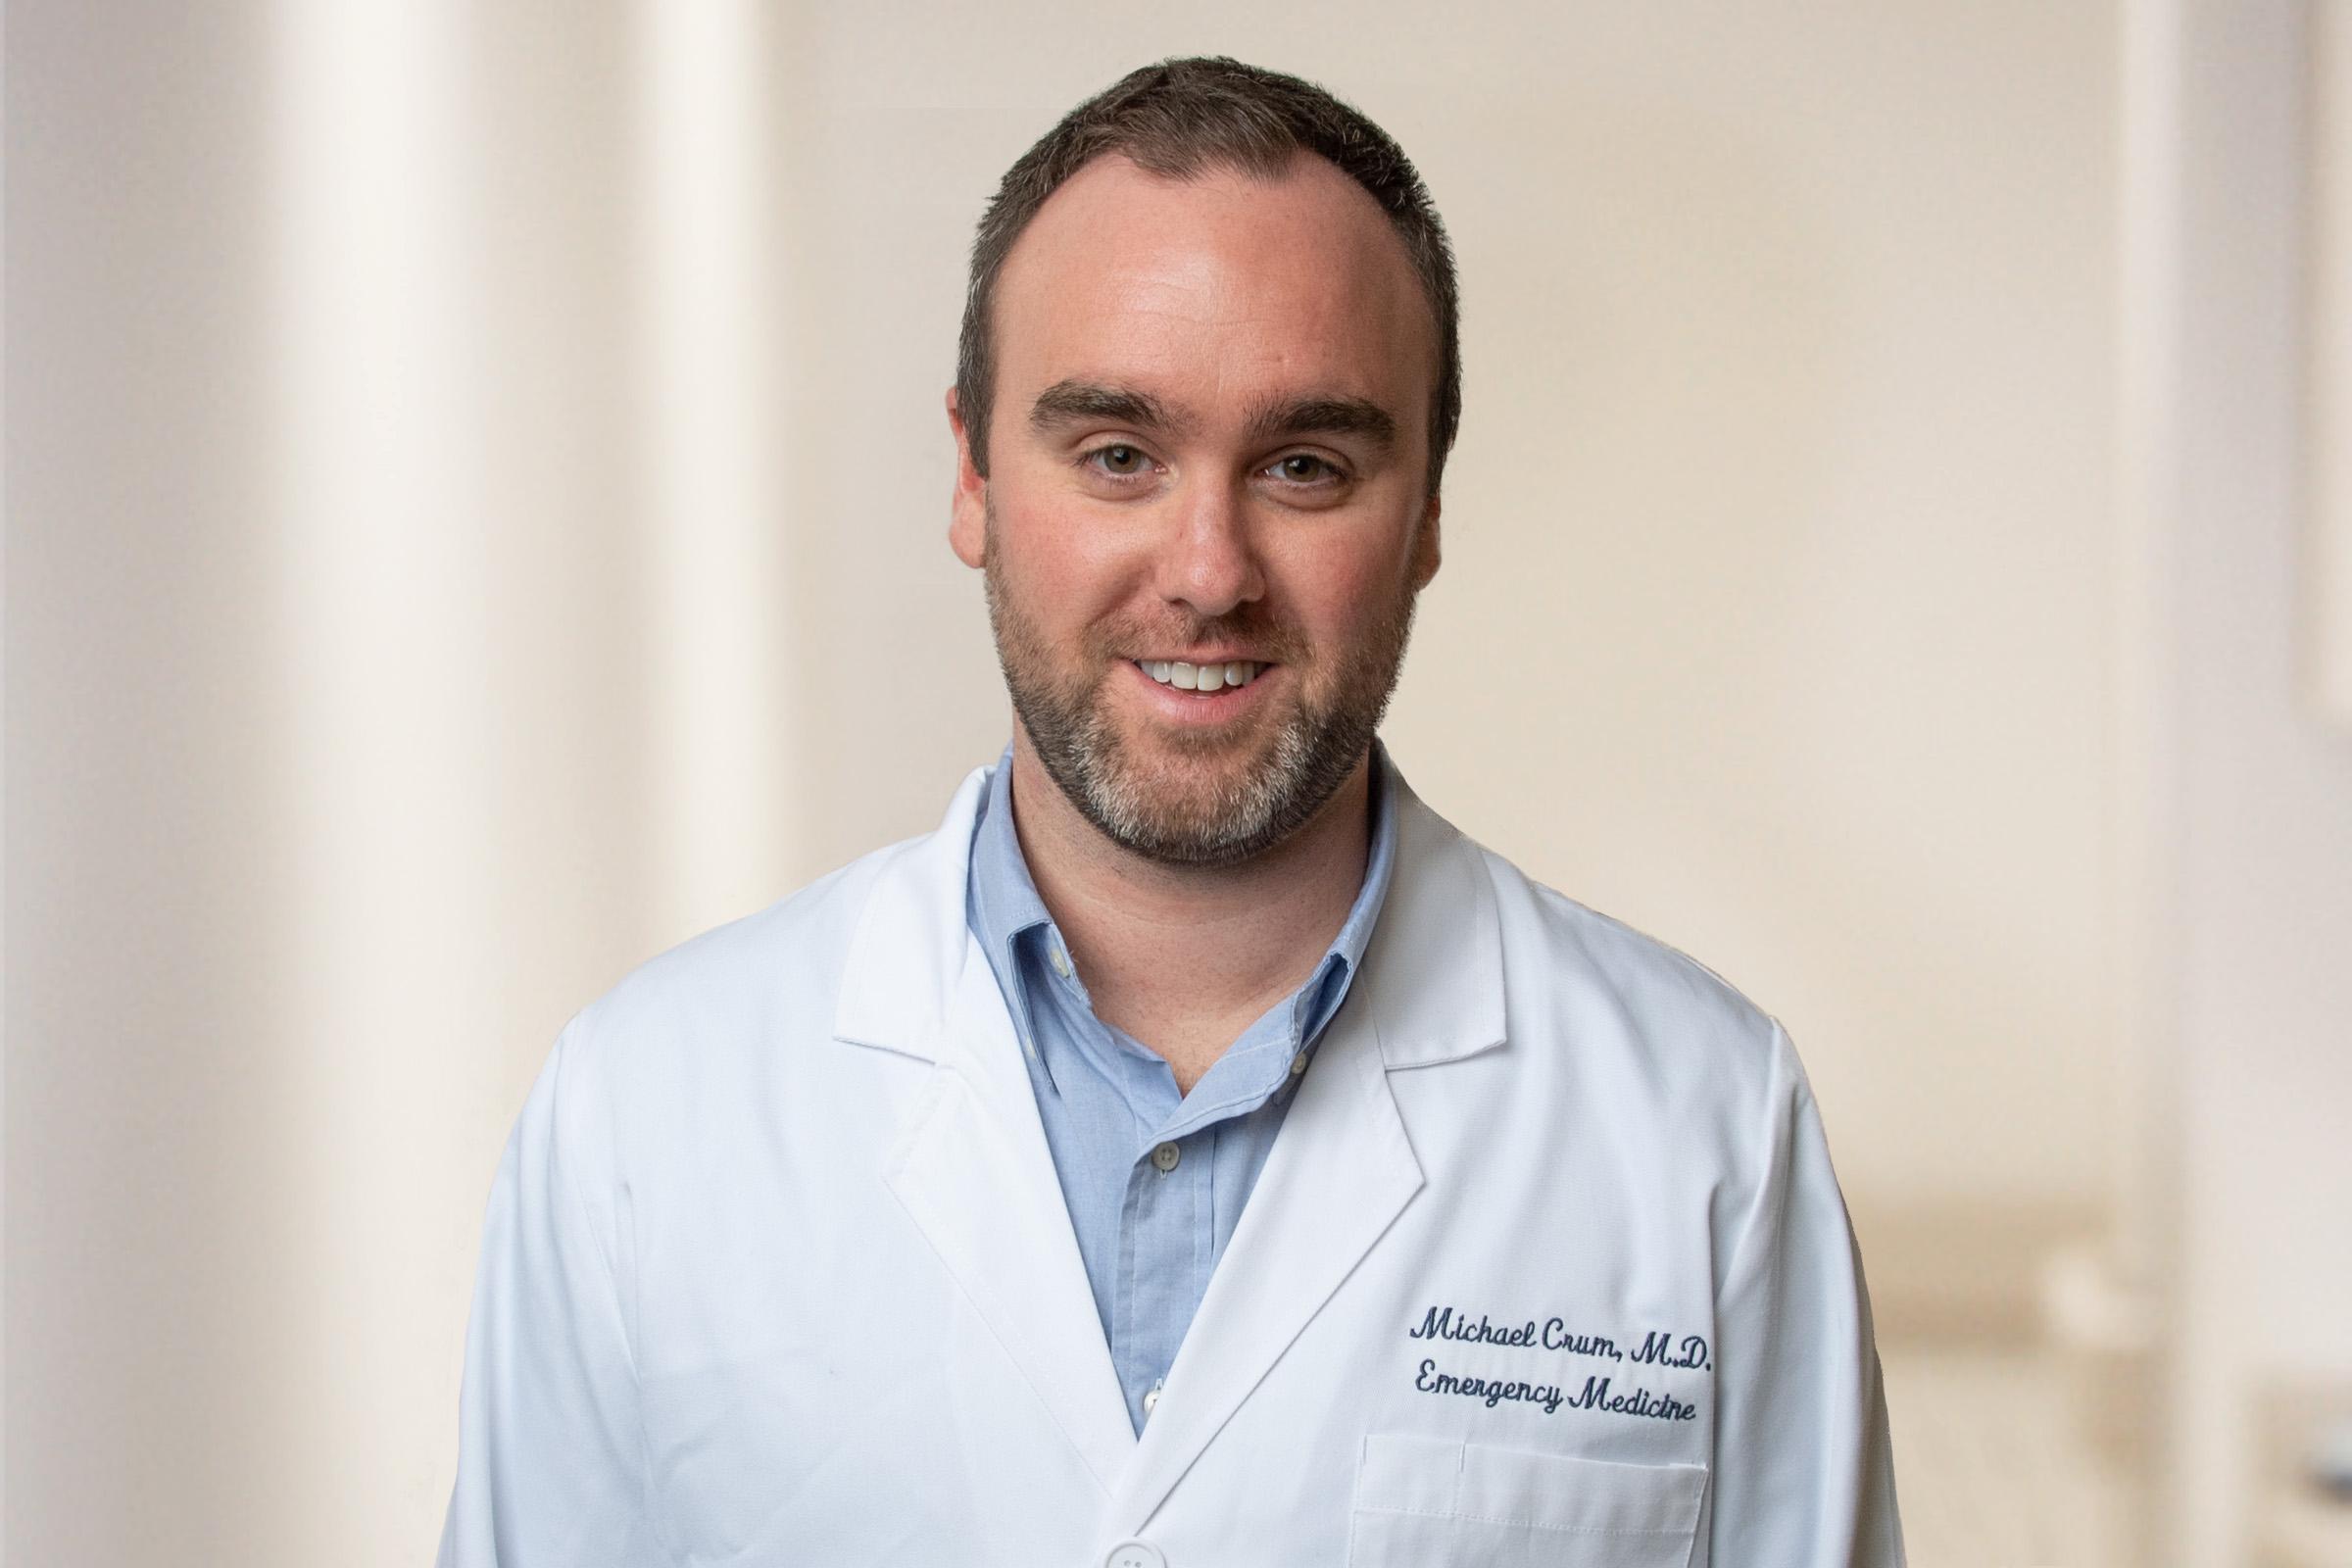 Michael Crum, MD